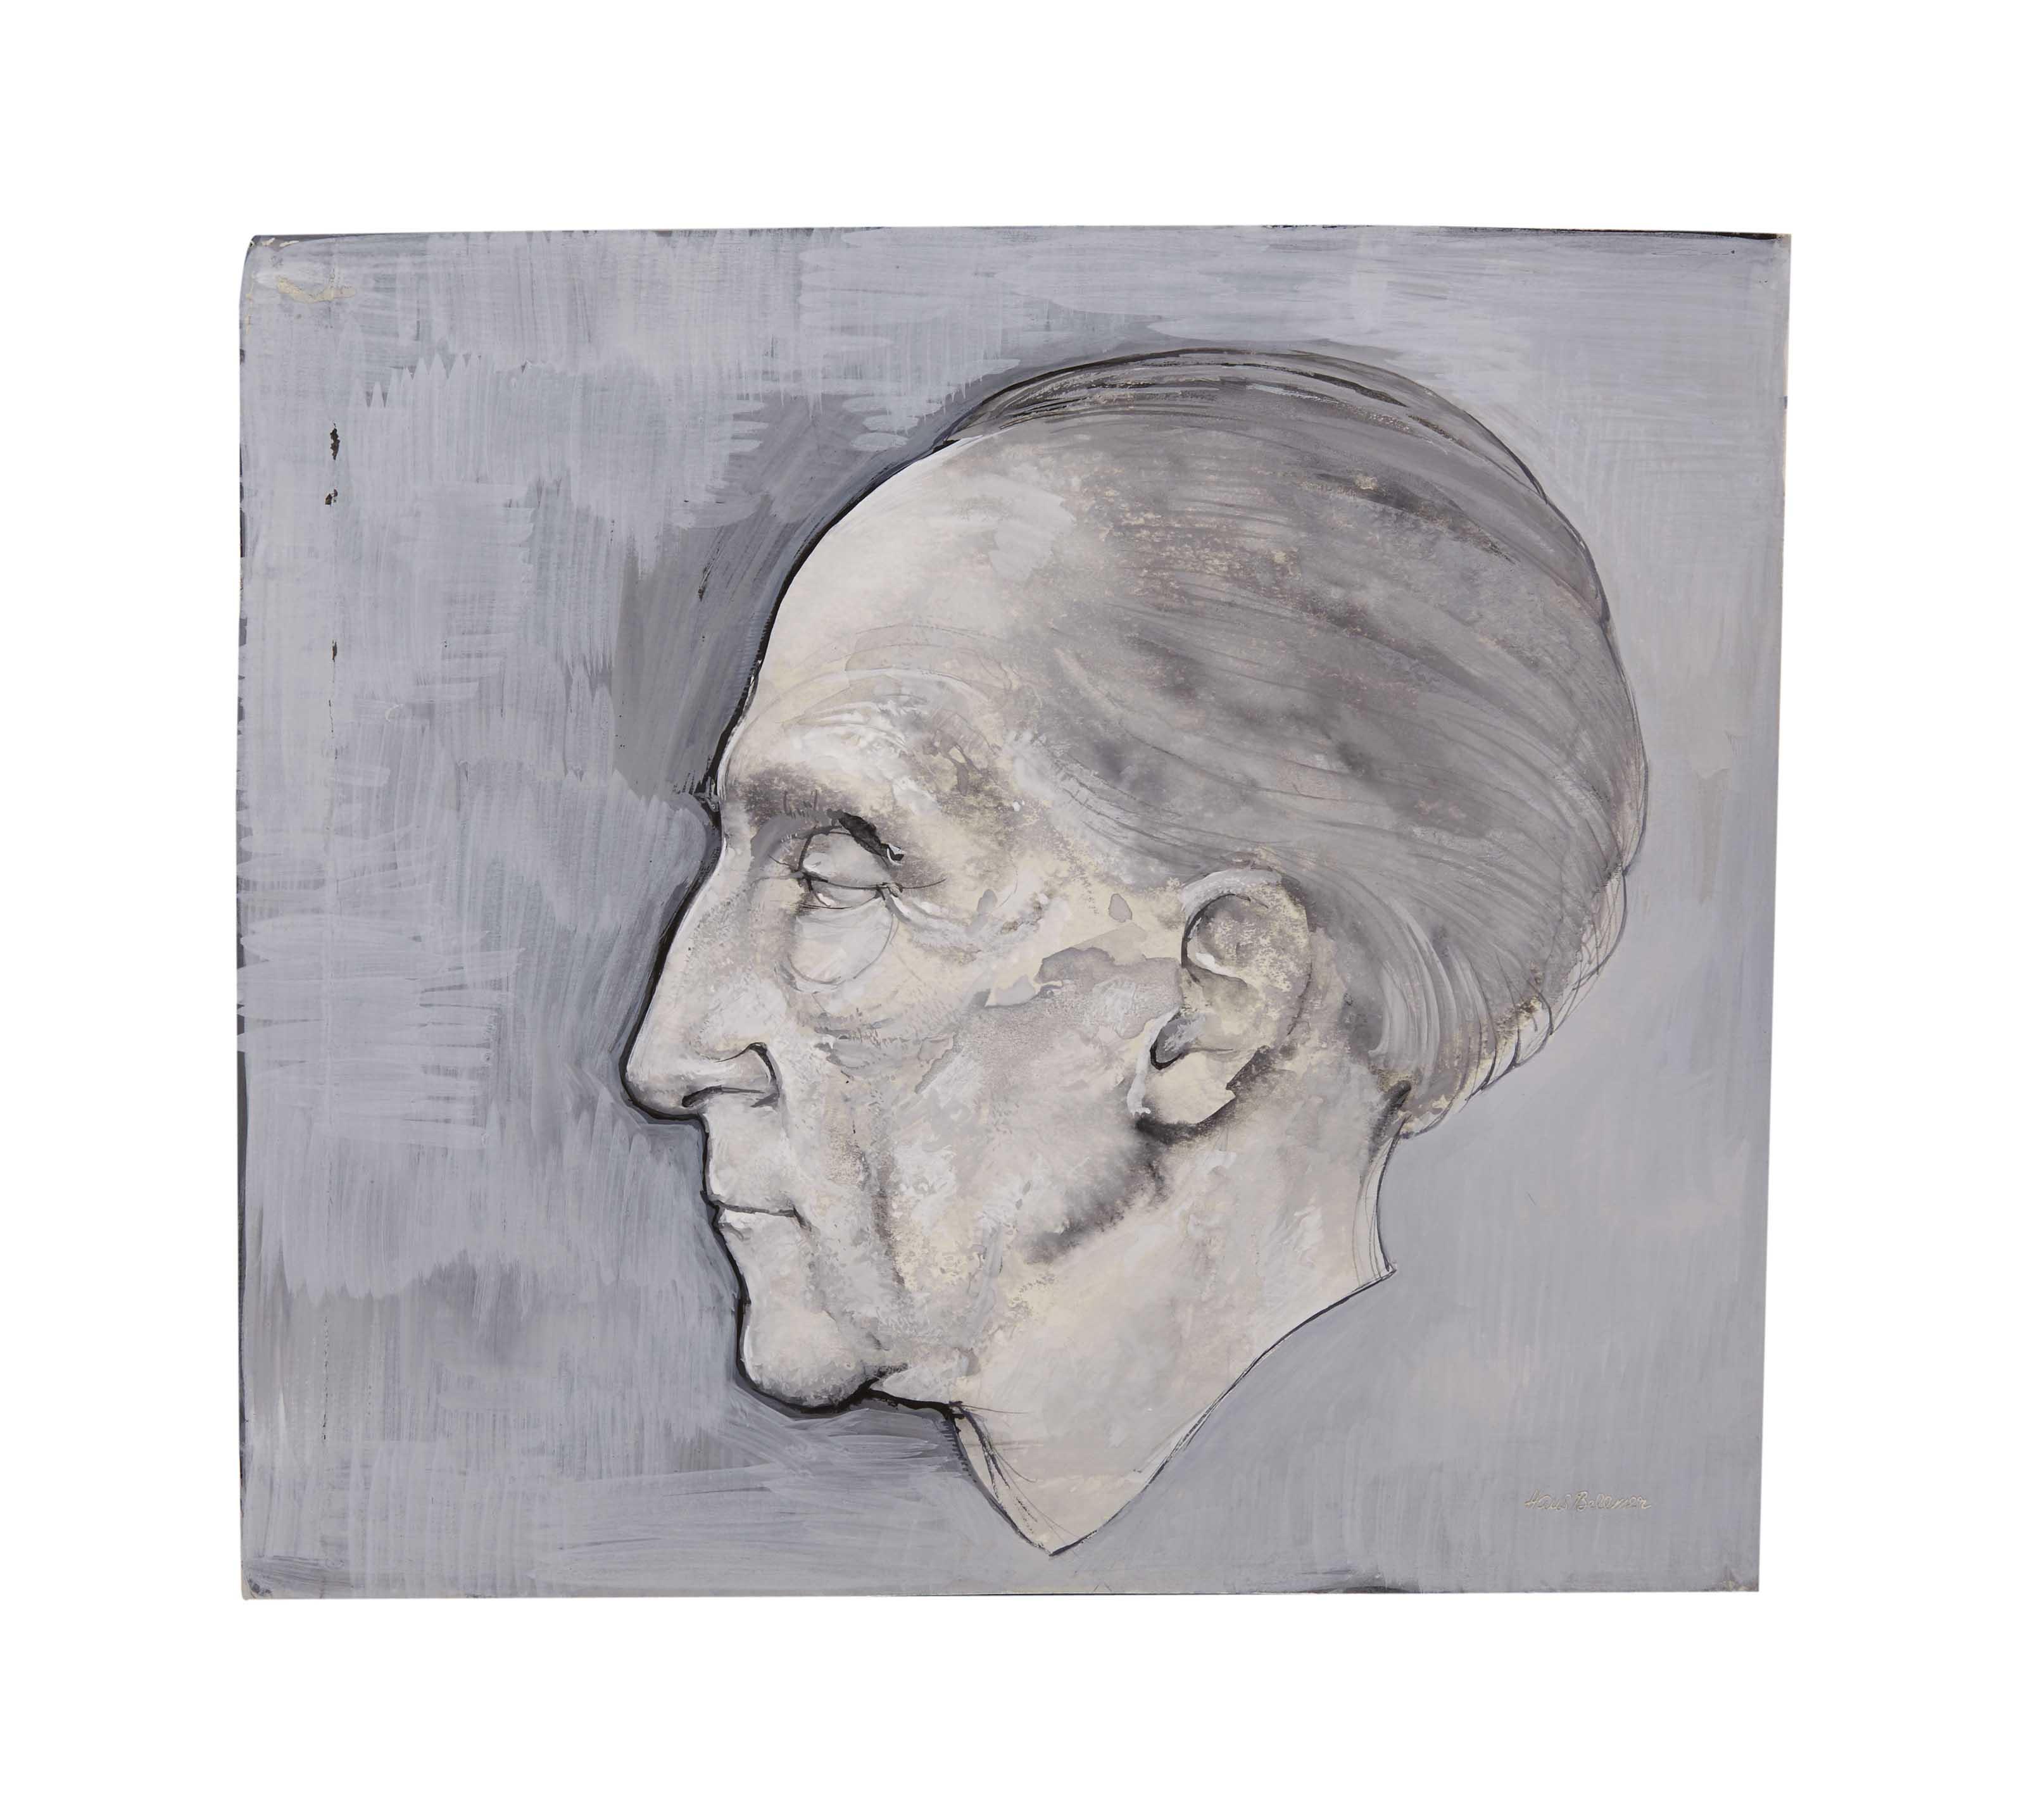 Portrait de Marcel Duchamp